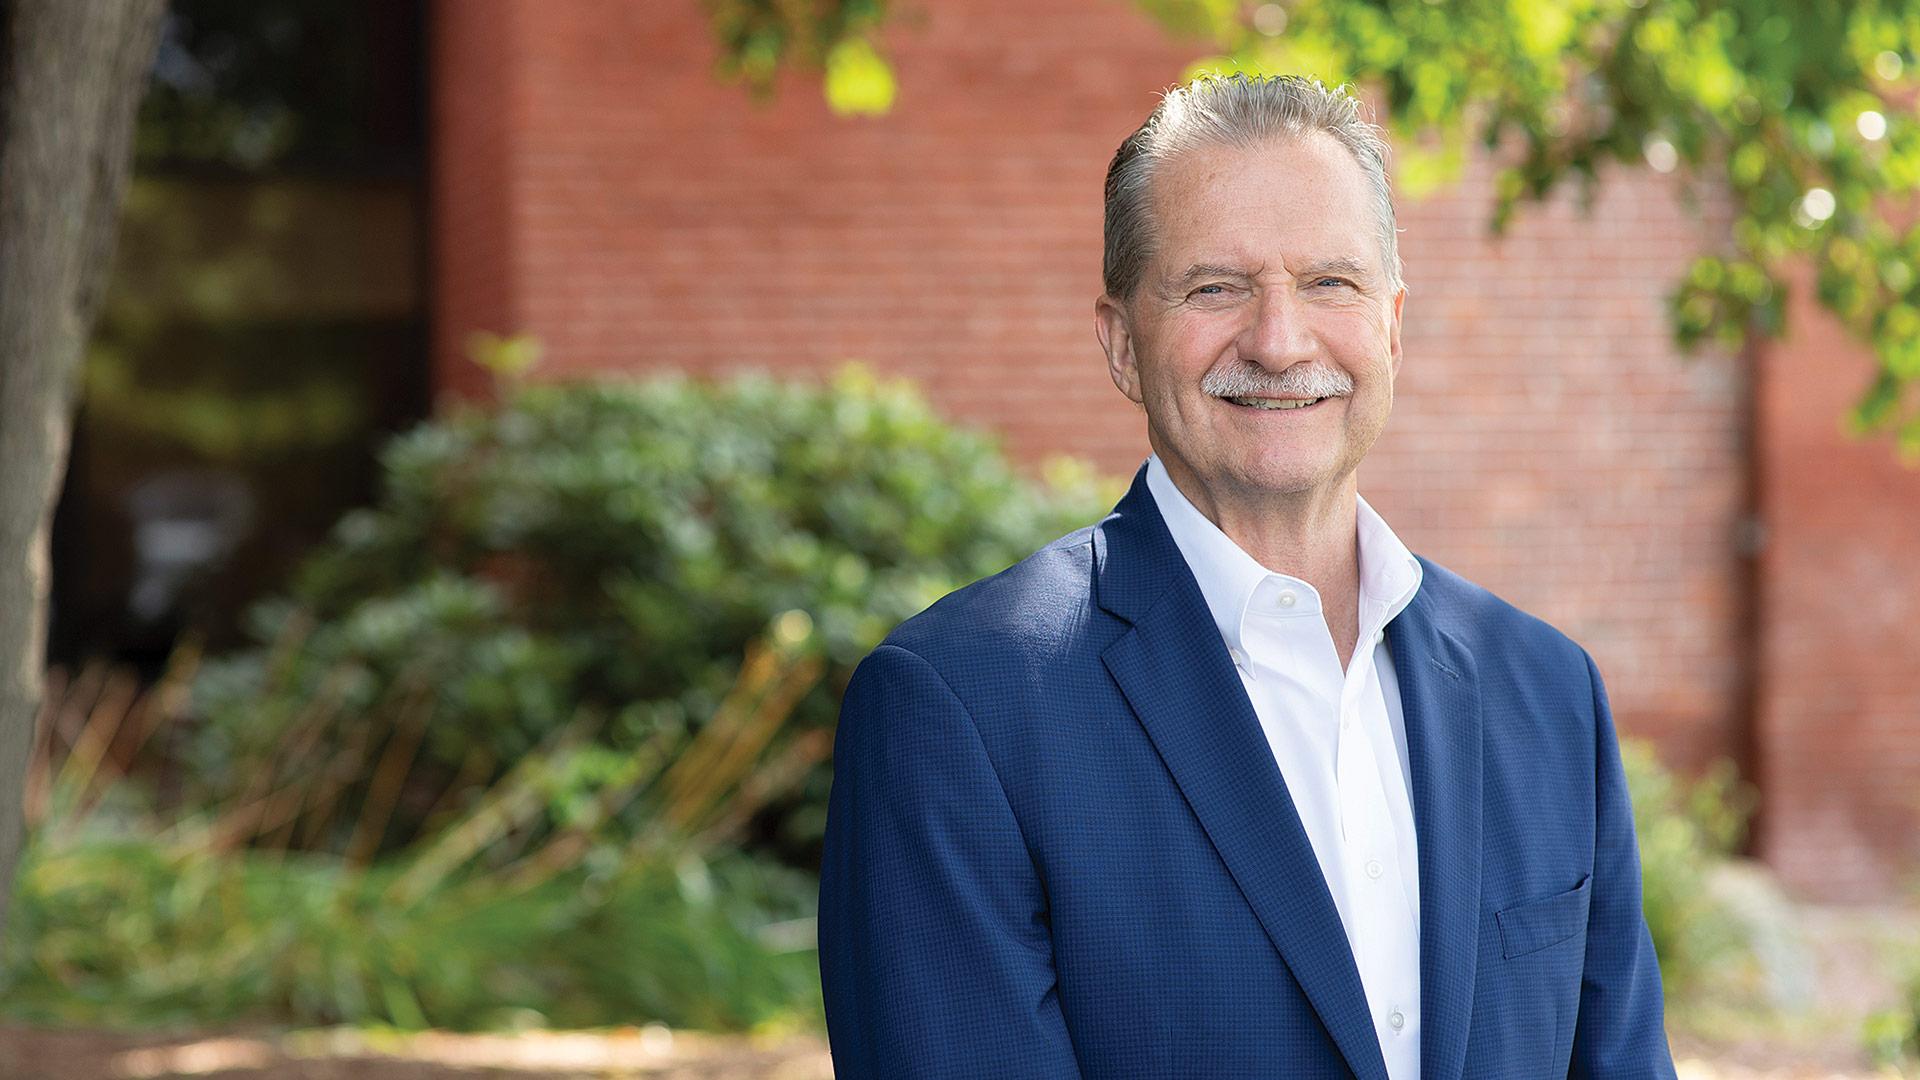 Jim Goodwin